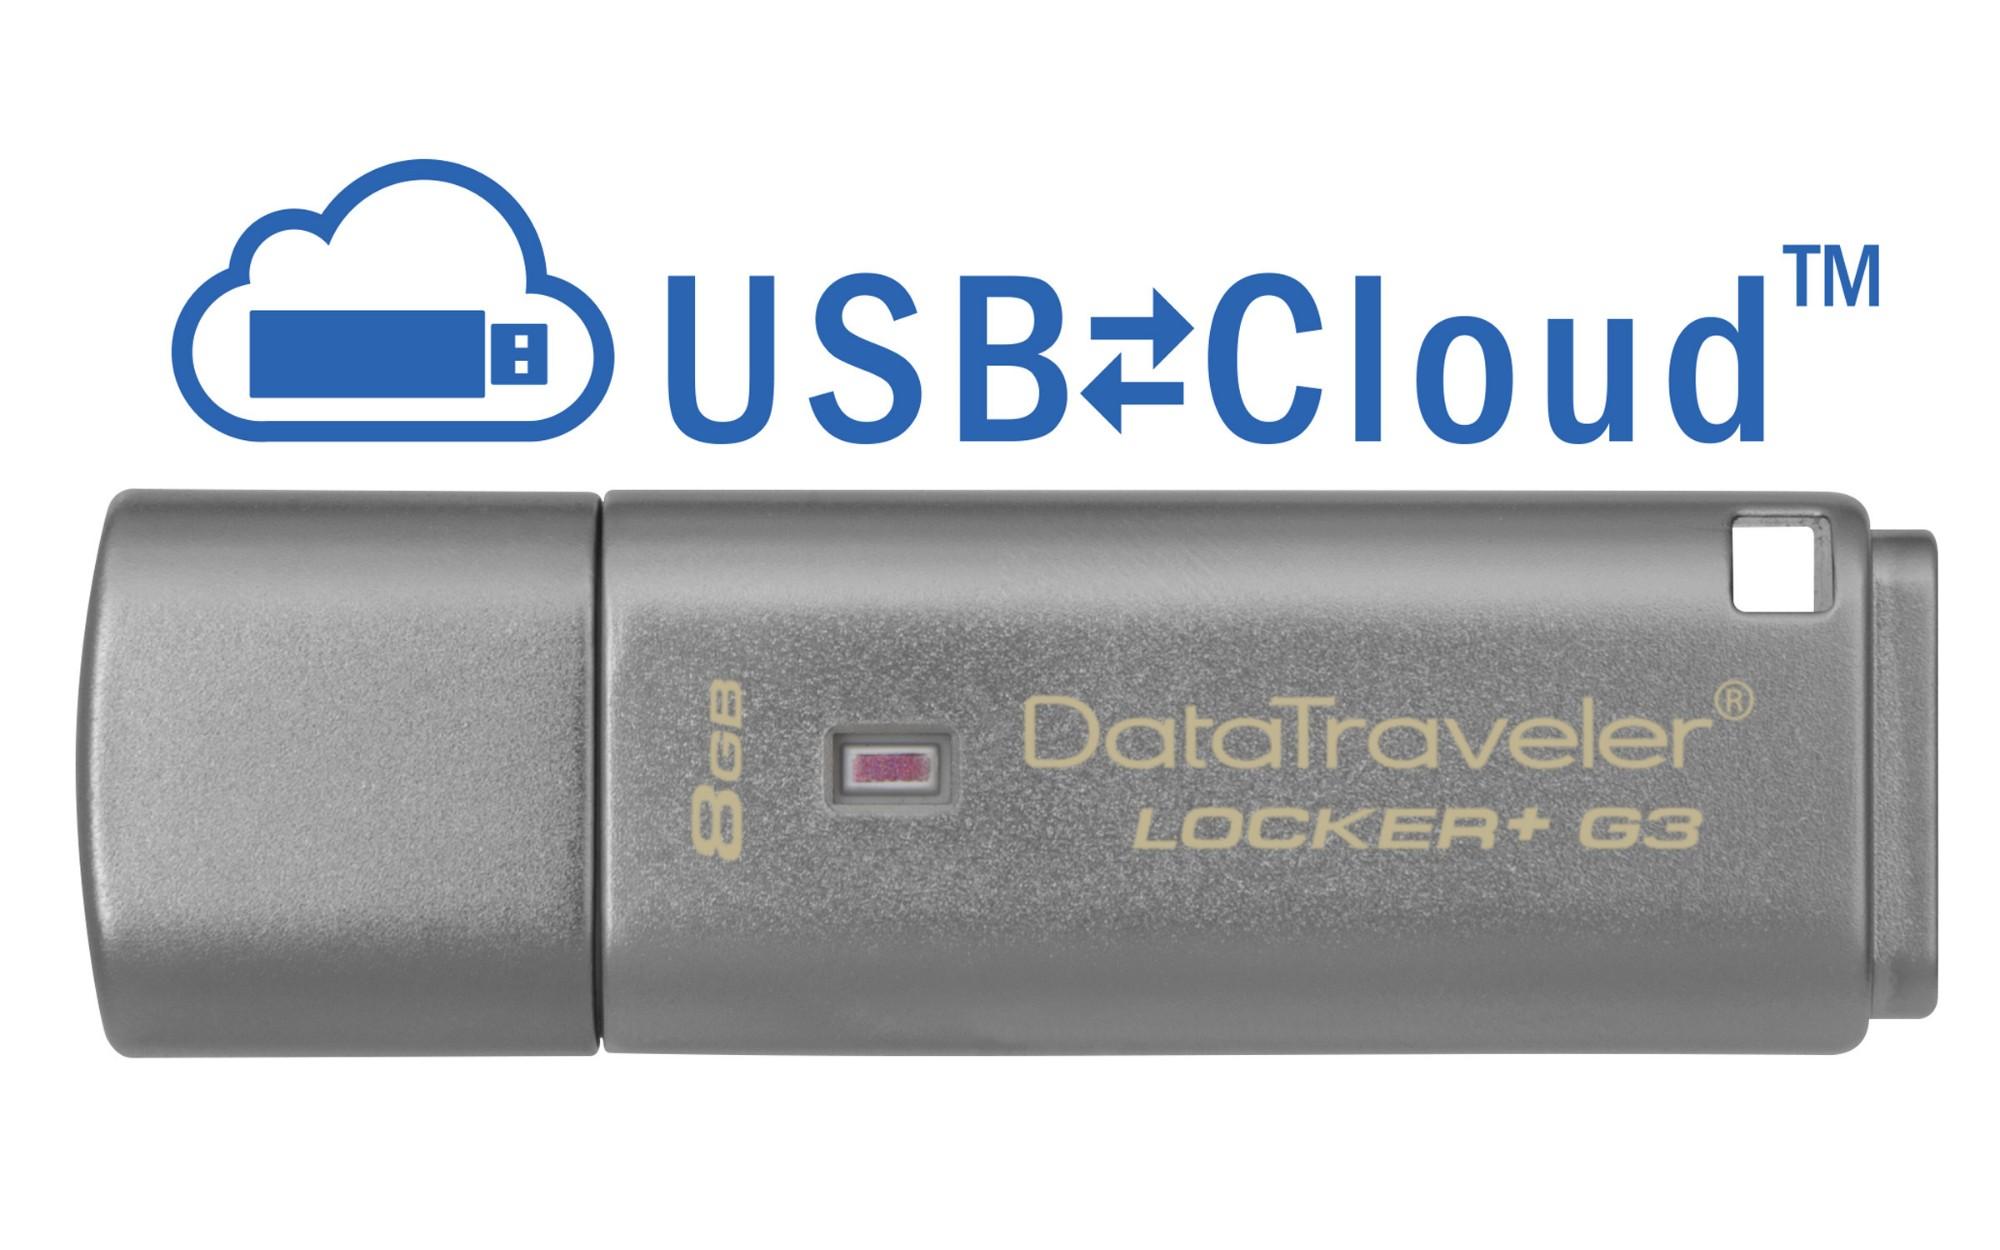 Kingston Technology DataTraveler Locker+ G3 8GB unidad flash USB USB tipo A 3.2 Gen 1 (3.1 Gen 1) Plata